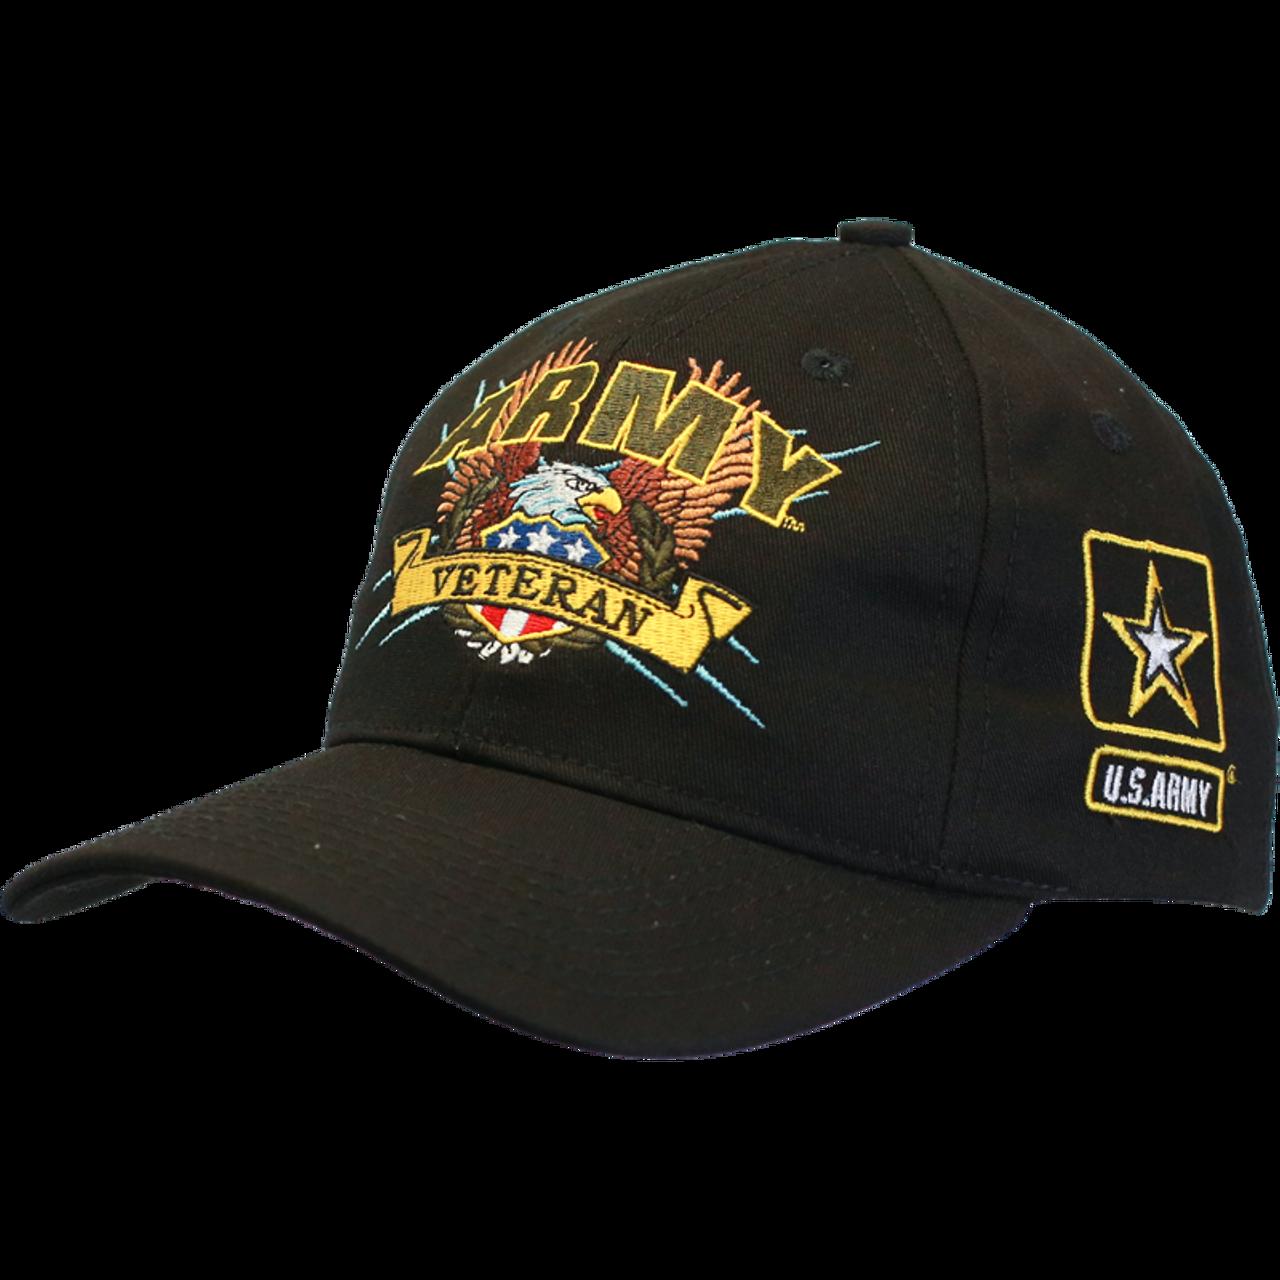 223f63d7a6d 19247 - Made In USA Military Hat - U.S. Army Veteran ...